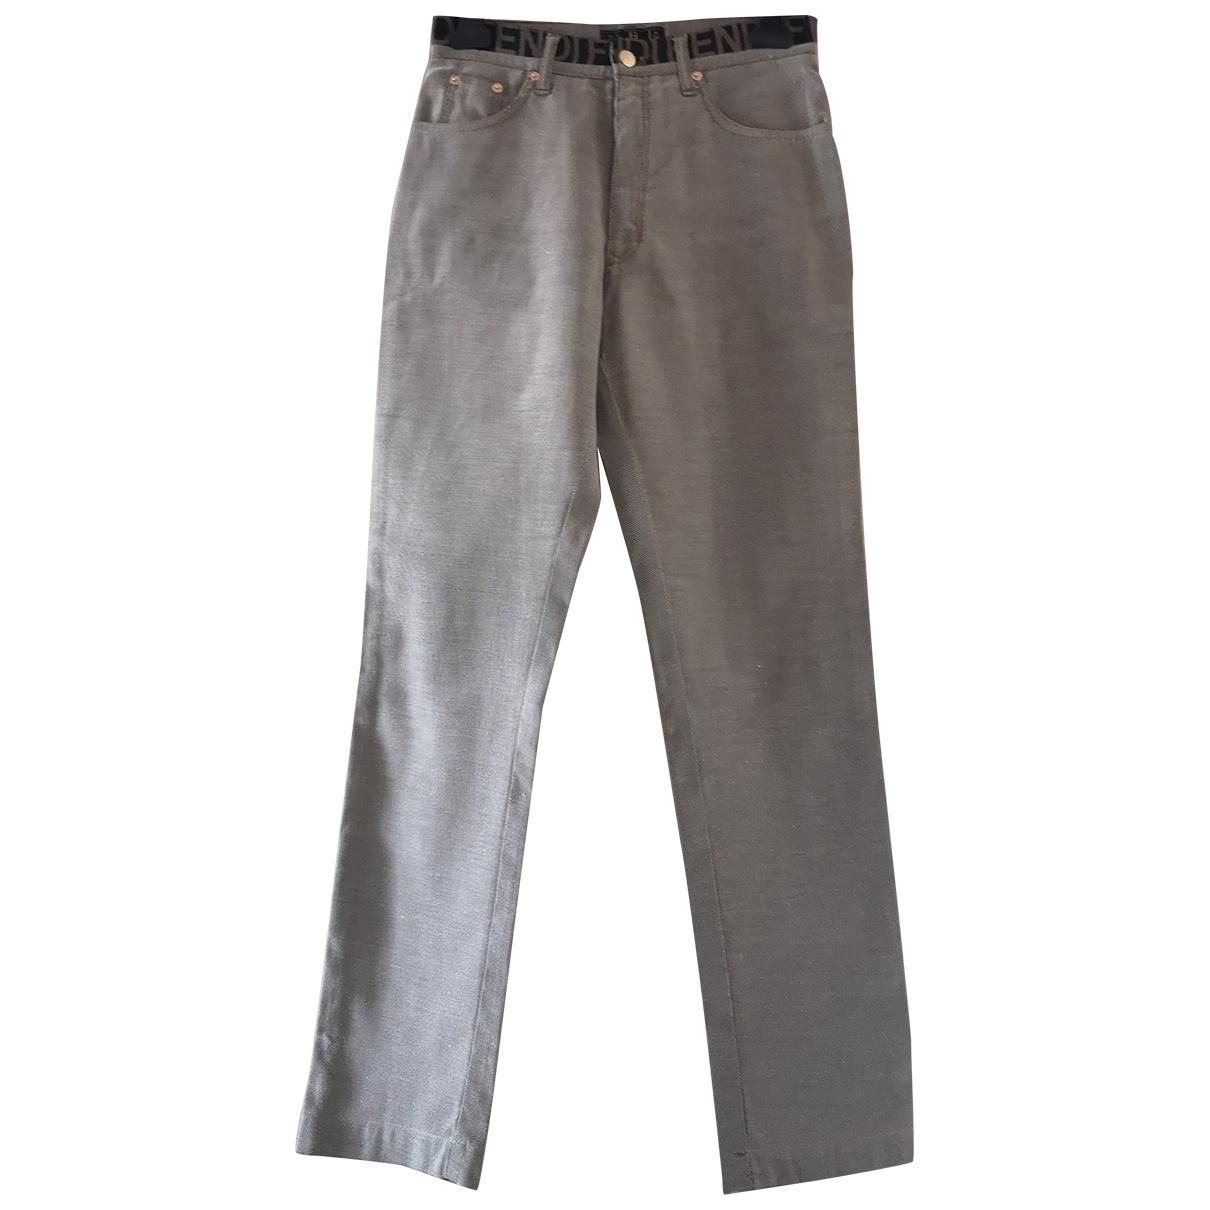 Fendi \N Beige Denim - Jeans Jeans for Women 32 FR